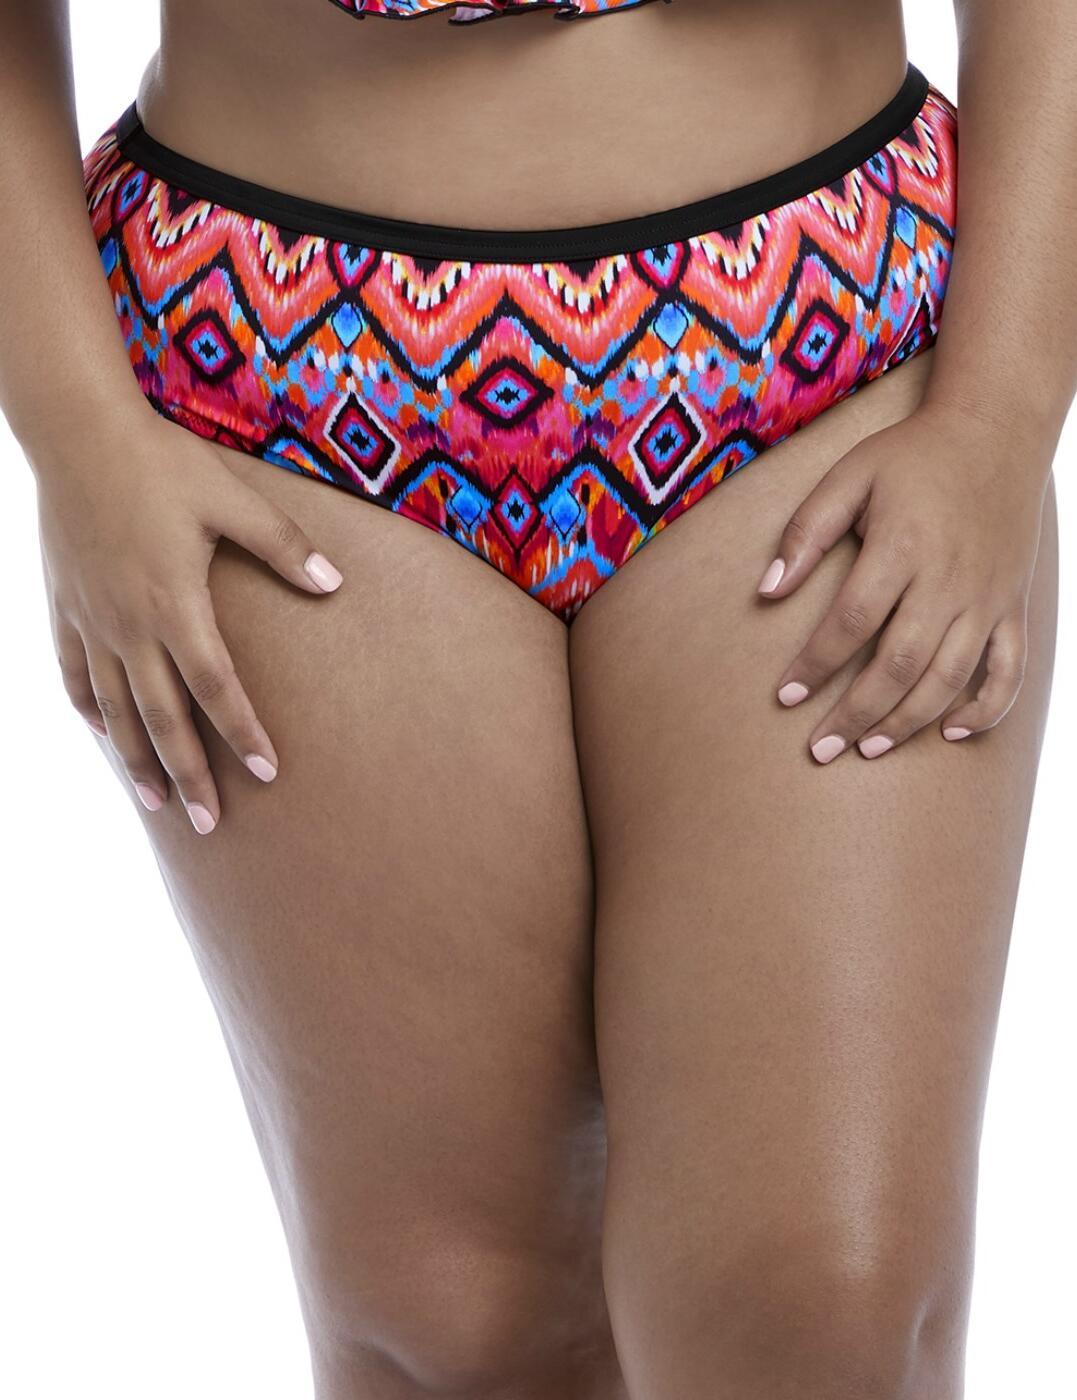 7575 Elomi Tribe Vibe Mid Rise Bikini Brief - 7575 Flame